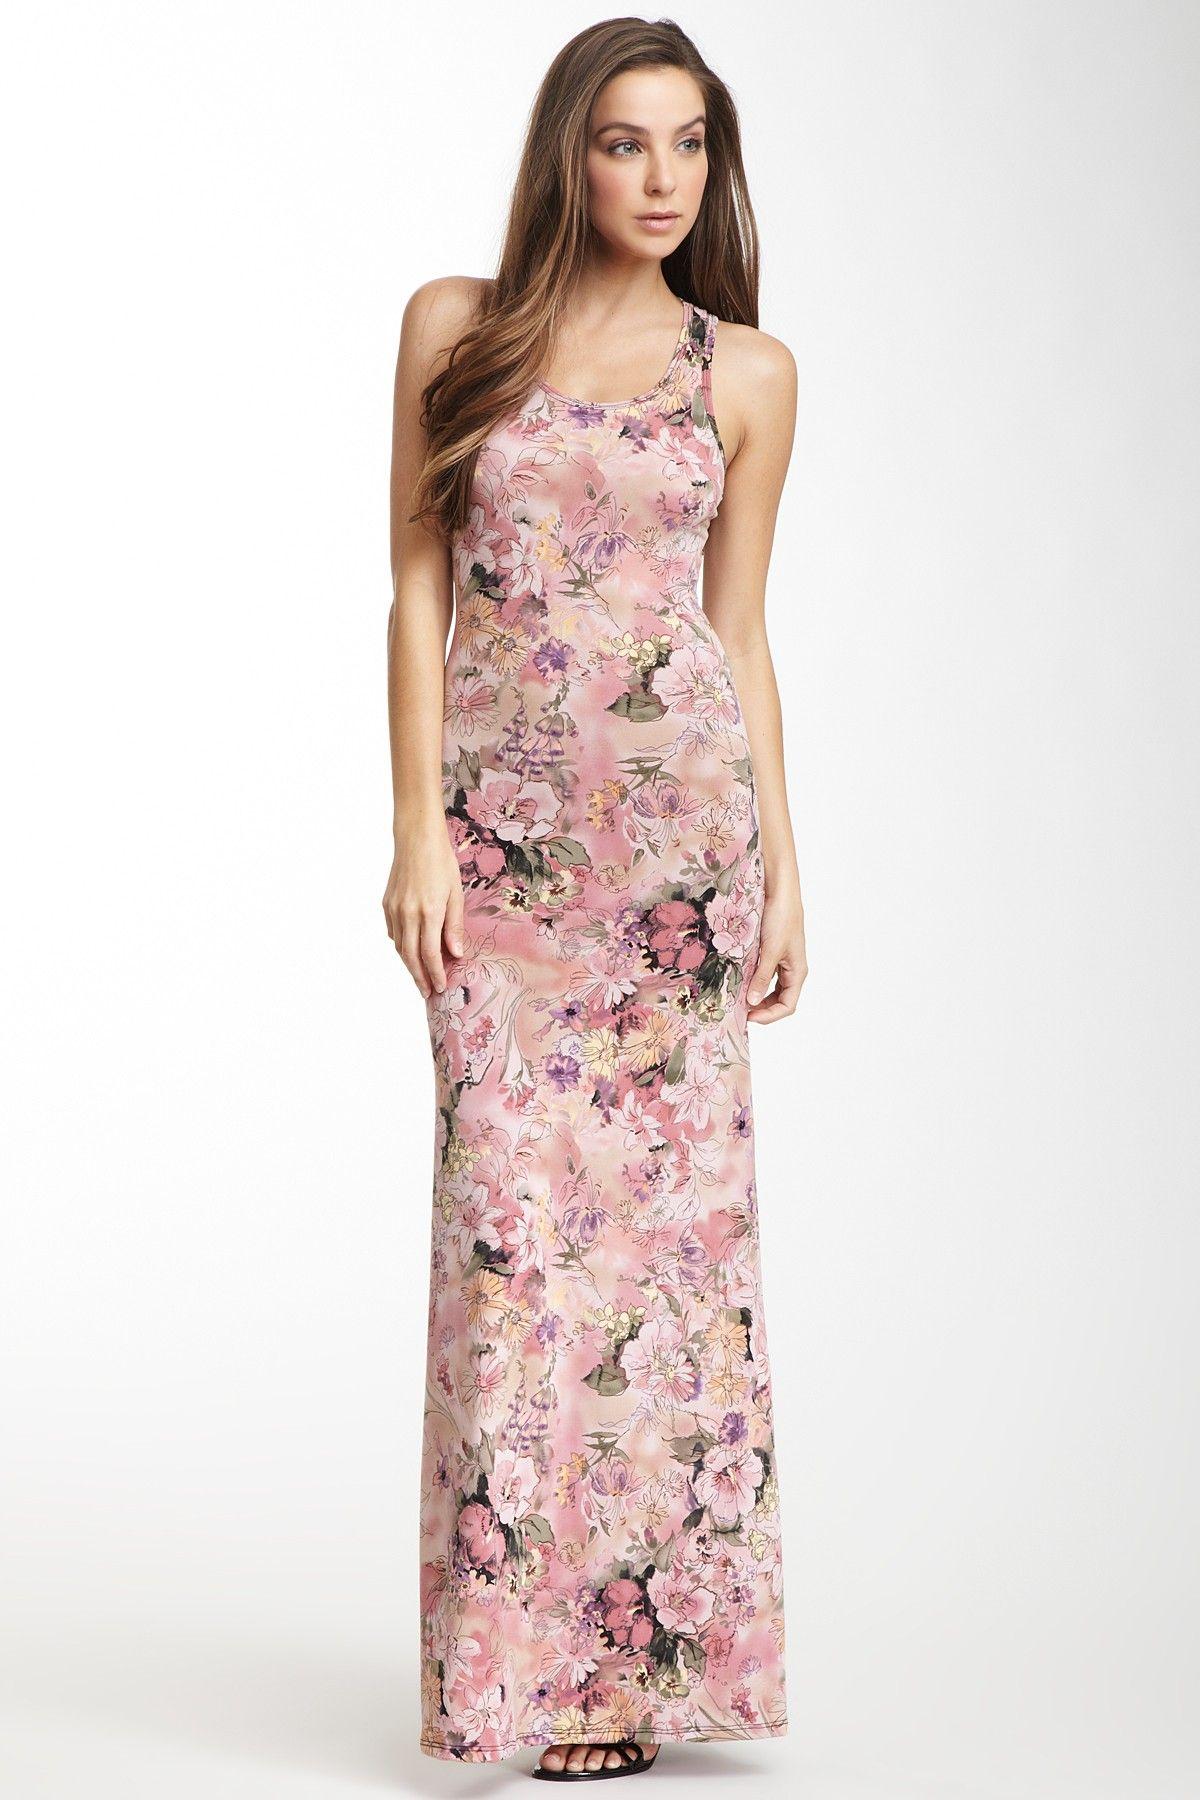 Go Couture Scoop Neck Maxi Dress | Fashion | Pinterest | Costura ...